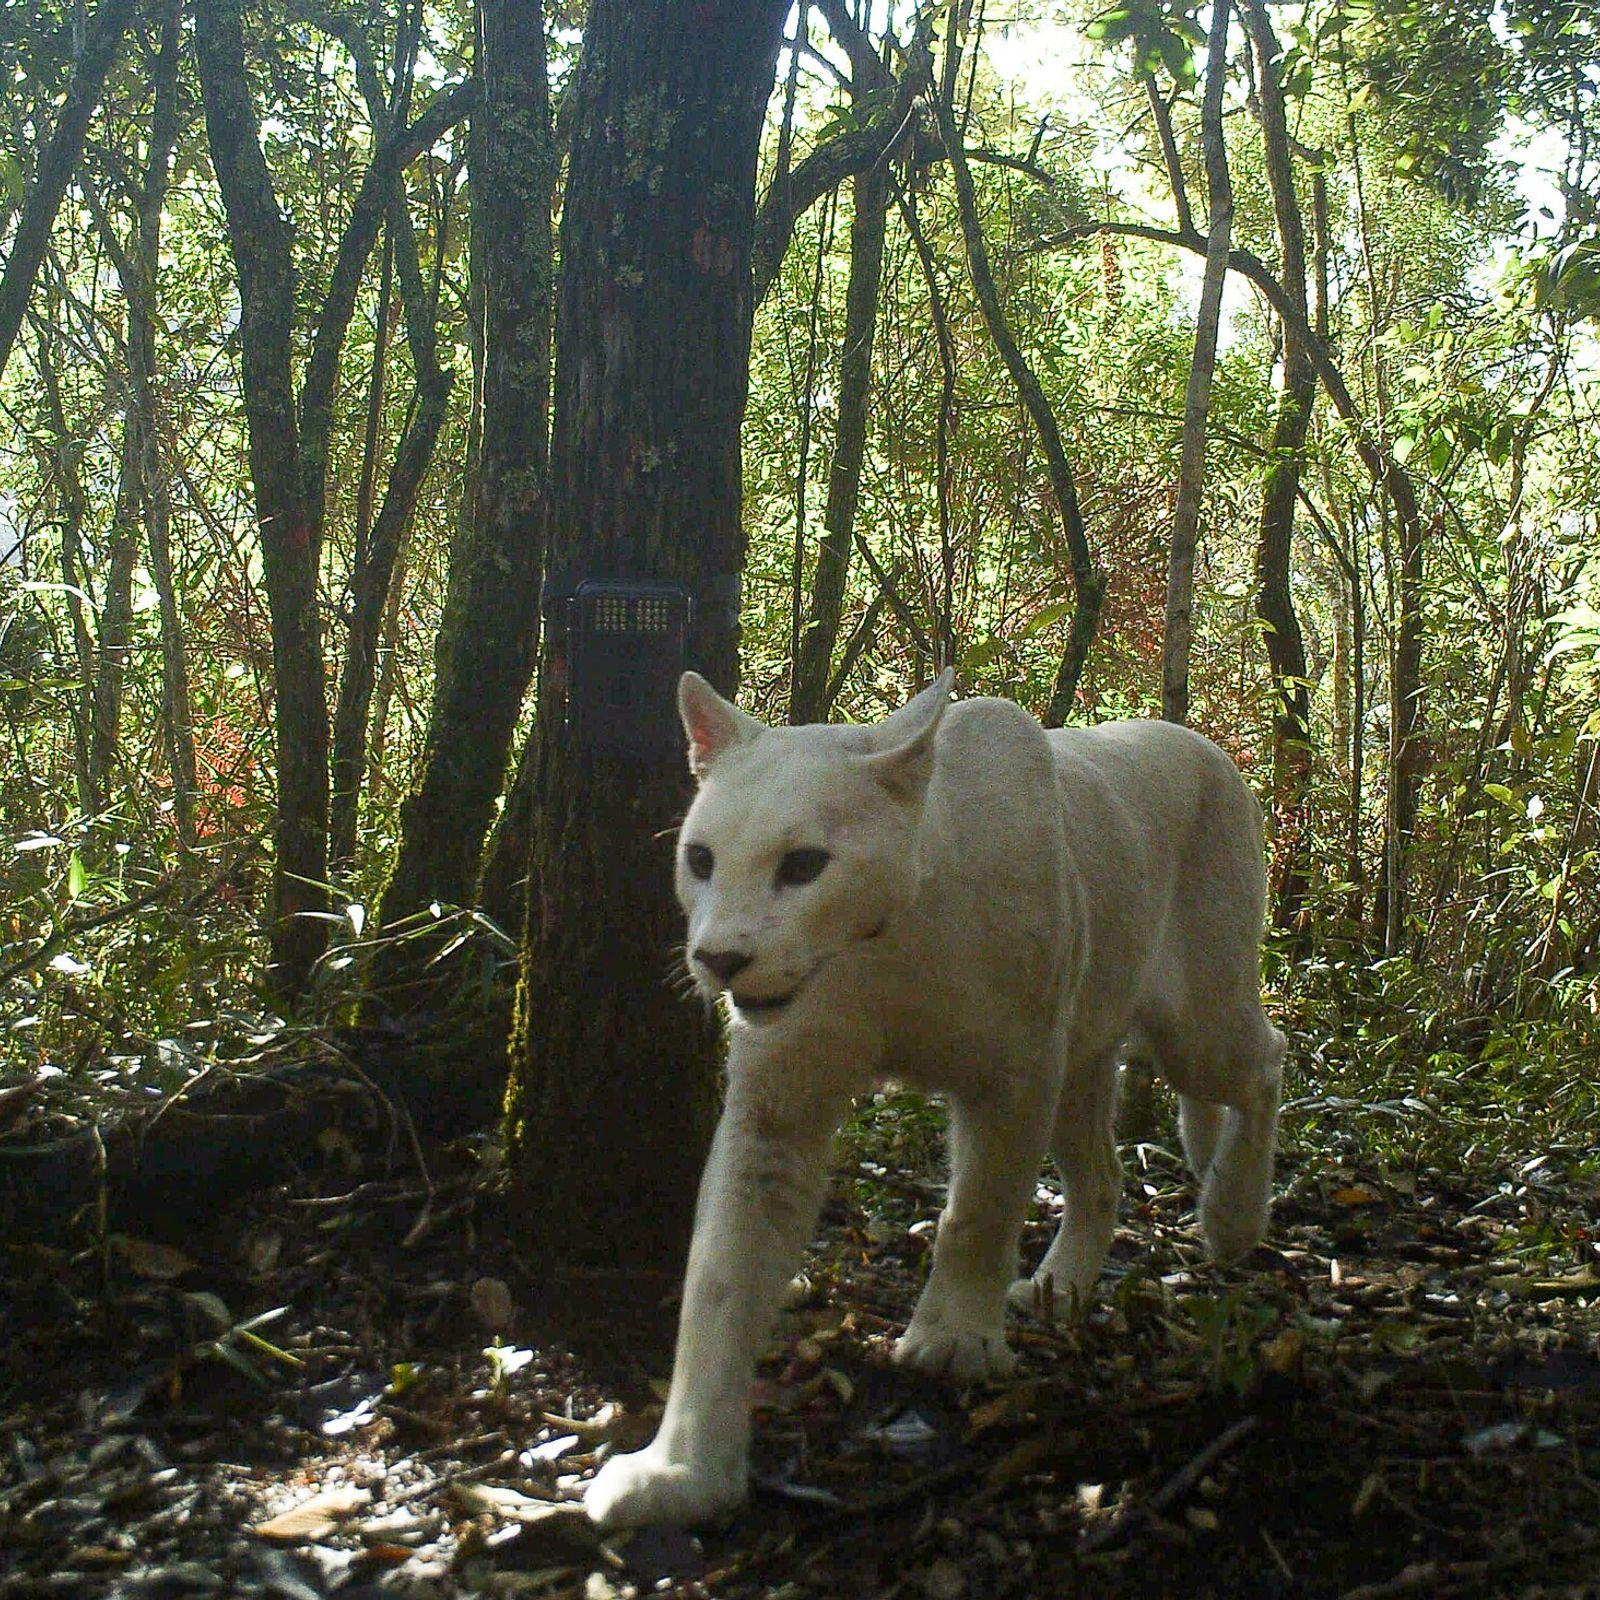 A leucistic cougar walks through southeastern Brazil's Serra dos Órgãos National Park on July 5, 2013. ...